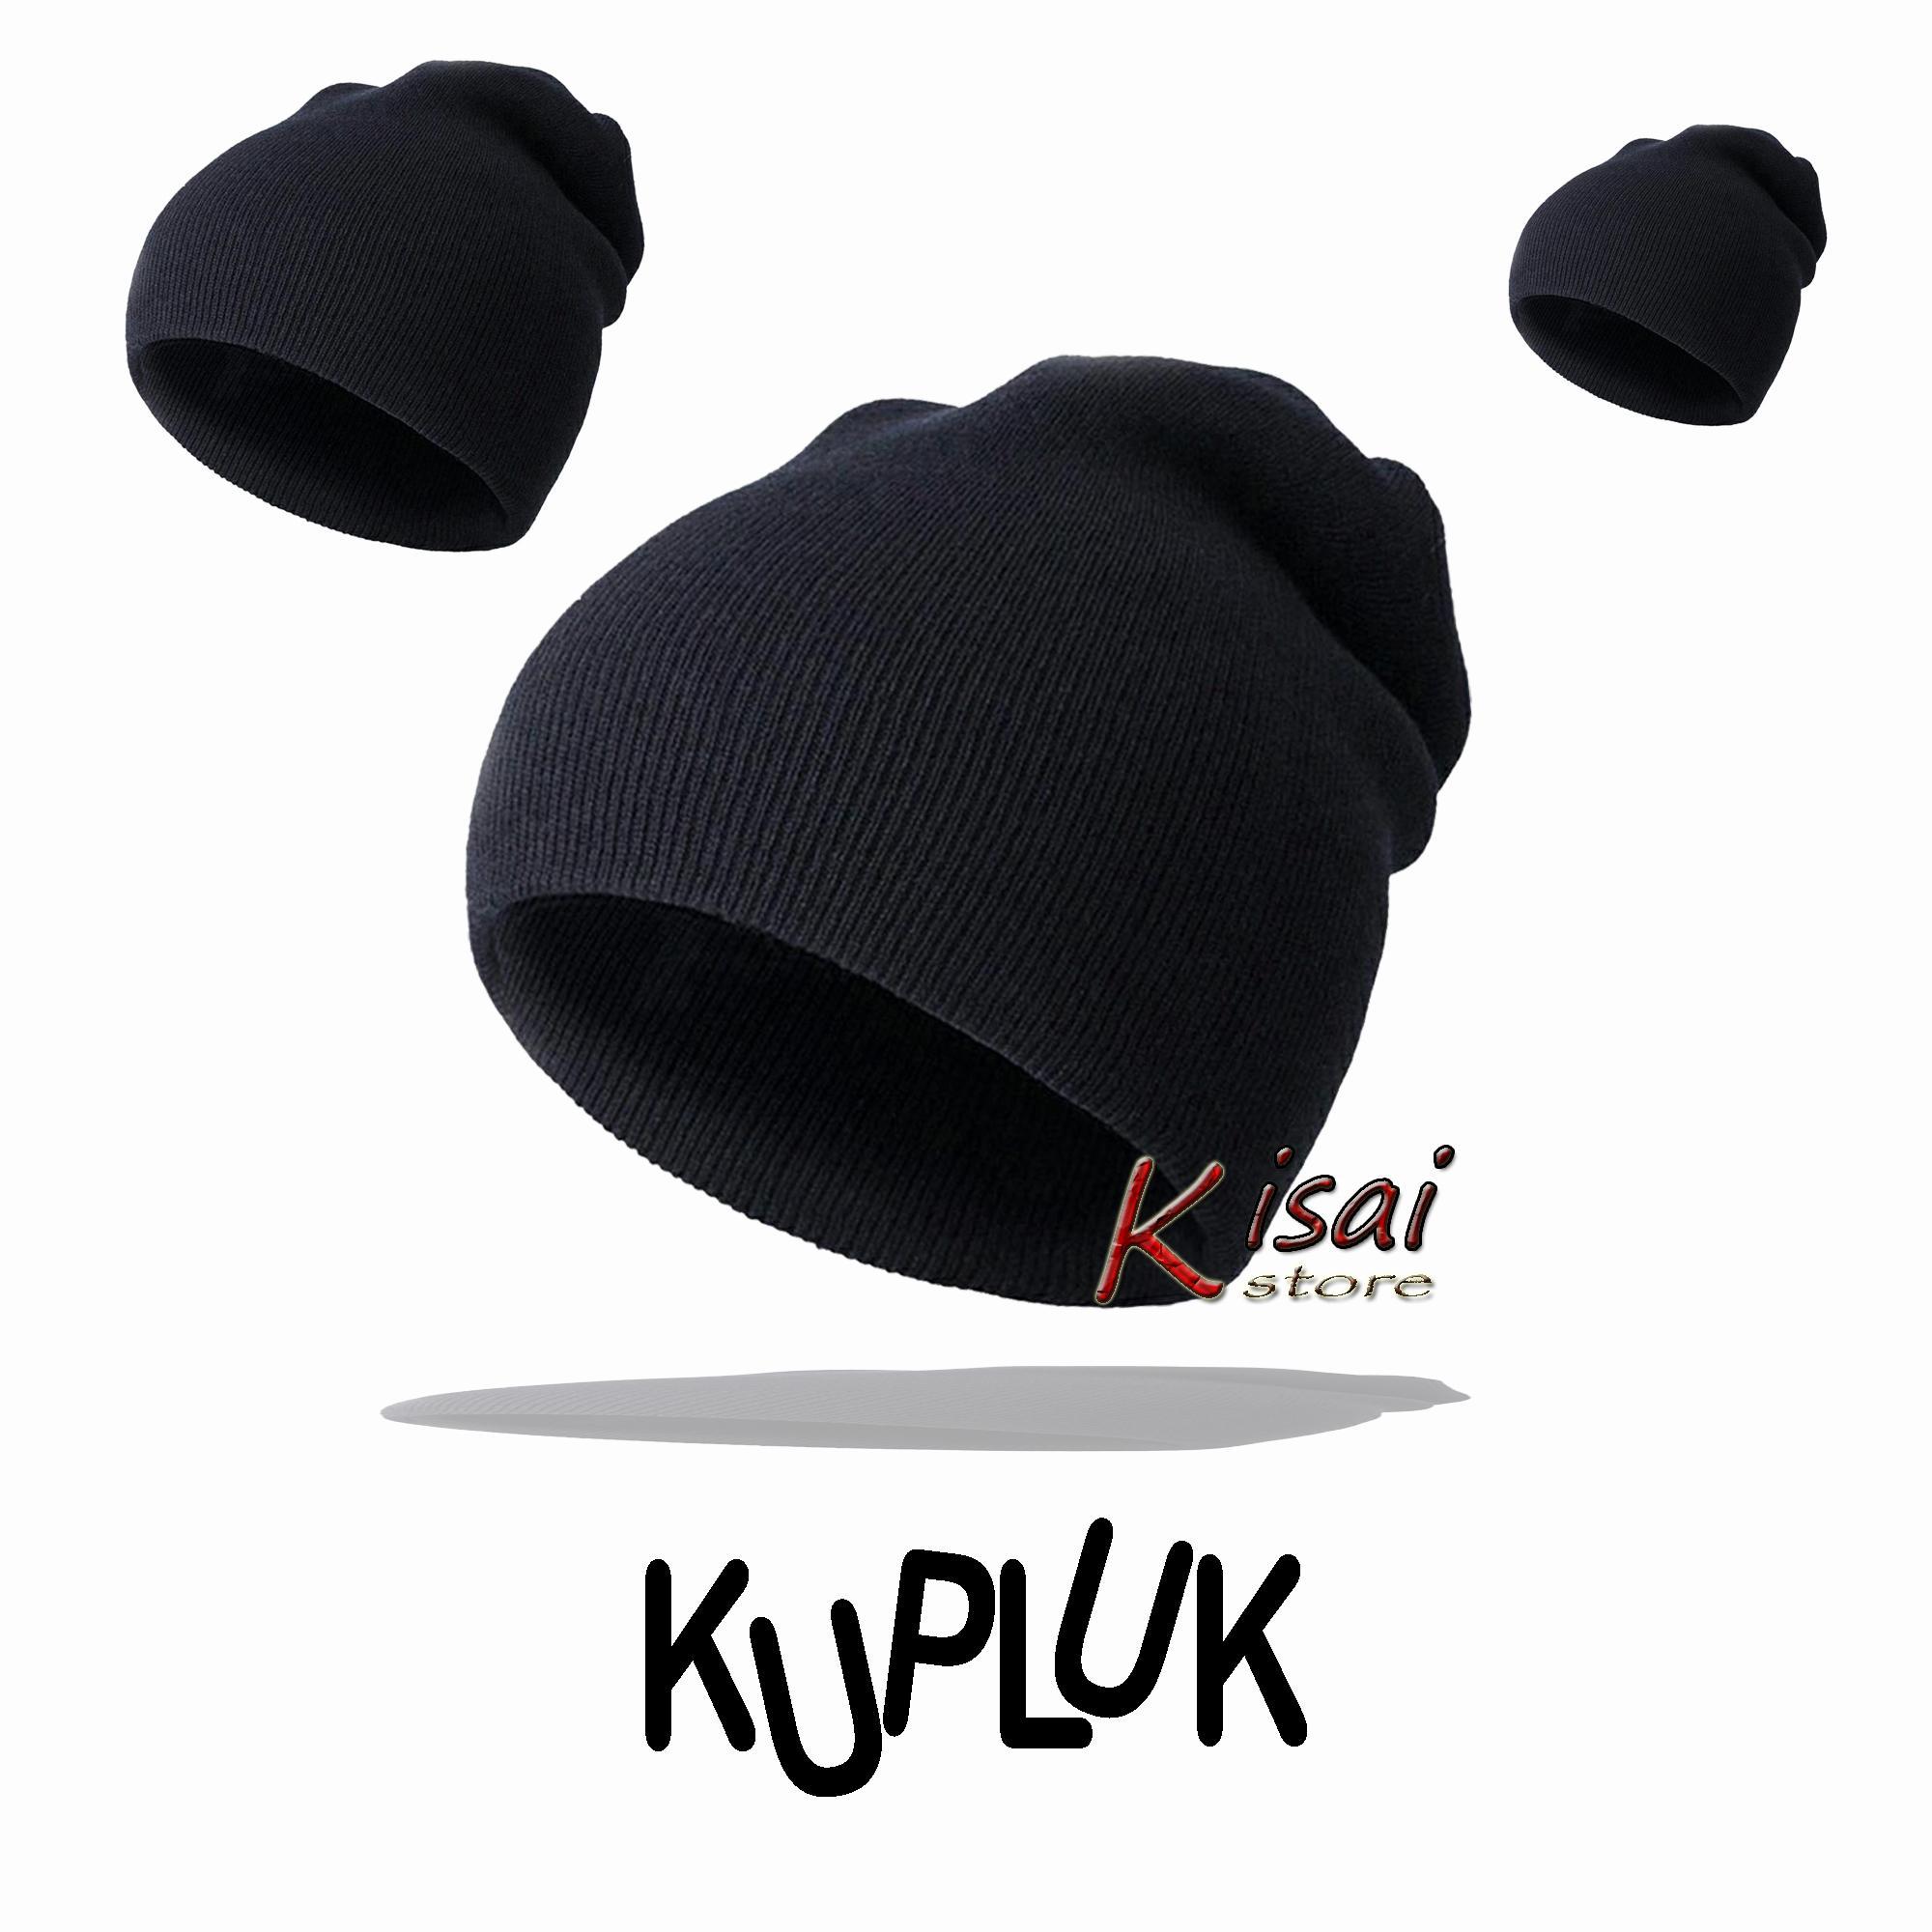 Topi Kupluk Rajut - Harga Grosir By Kisai Store.